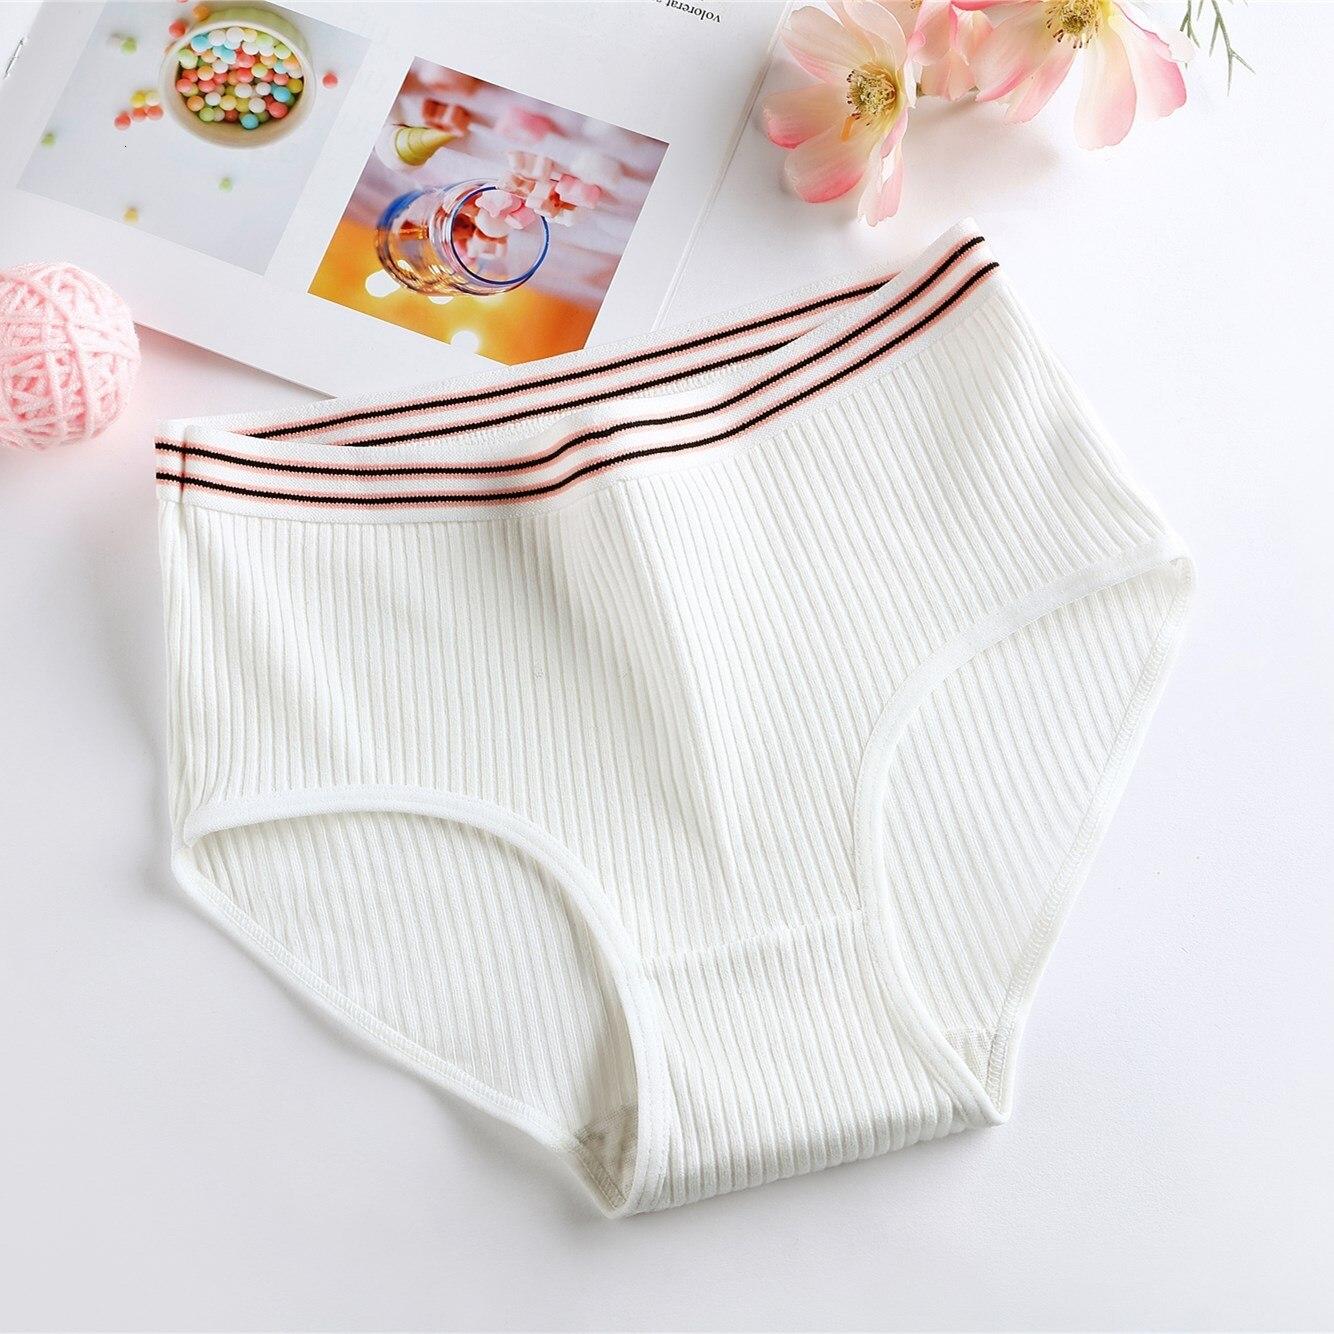 3 PCS Underwear Women Girls Panties Plus Size Briefs Sexy Panties Women Lingeries Calcinhas Shorts Underpants Solid Panty NEW